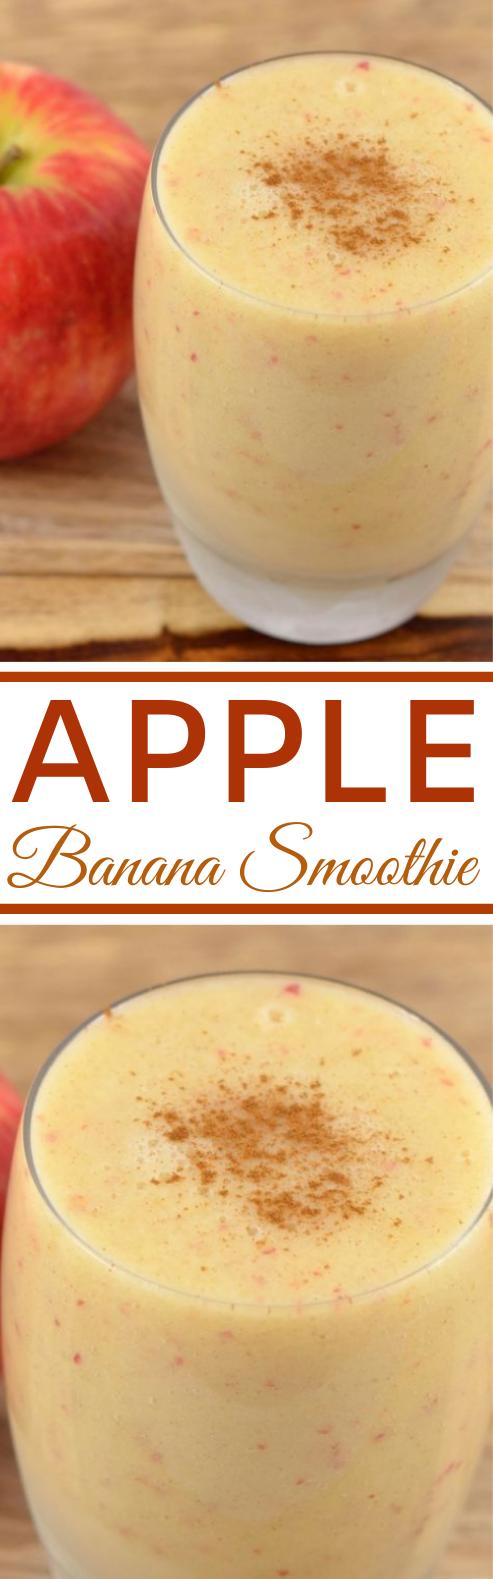 Apple Banana Smoothie #smoothies #drinks #healthy #breakfast #snacks